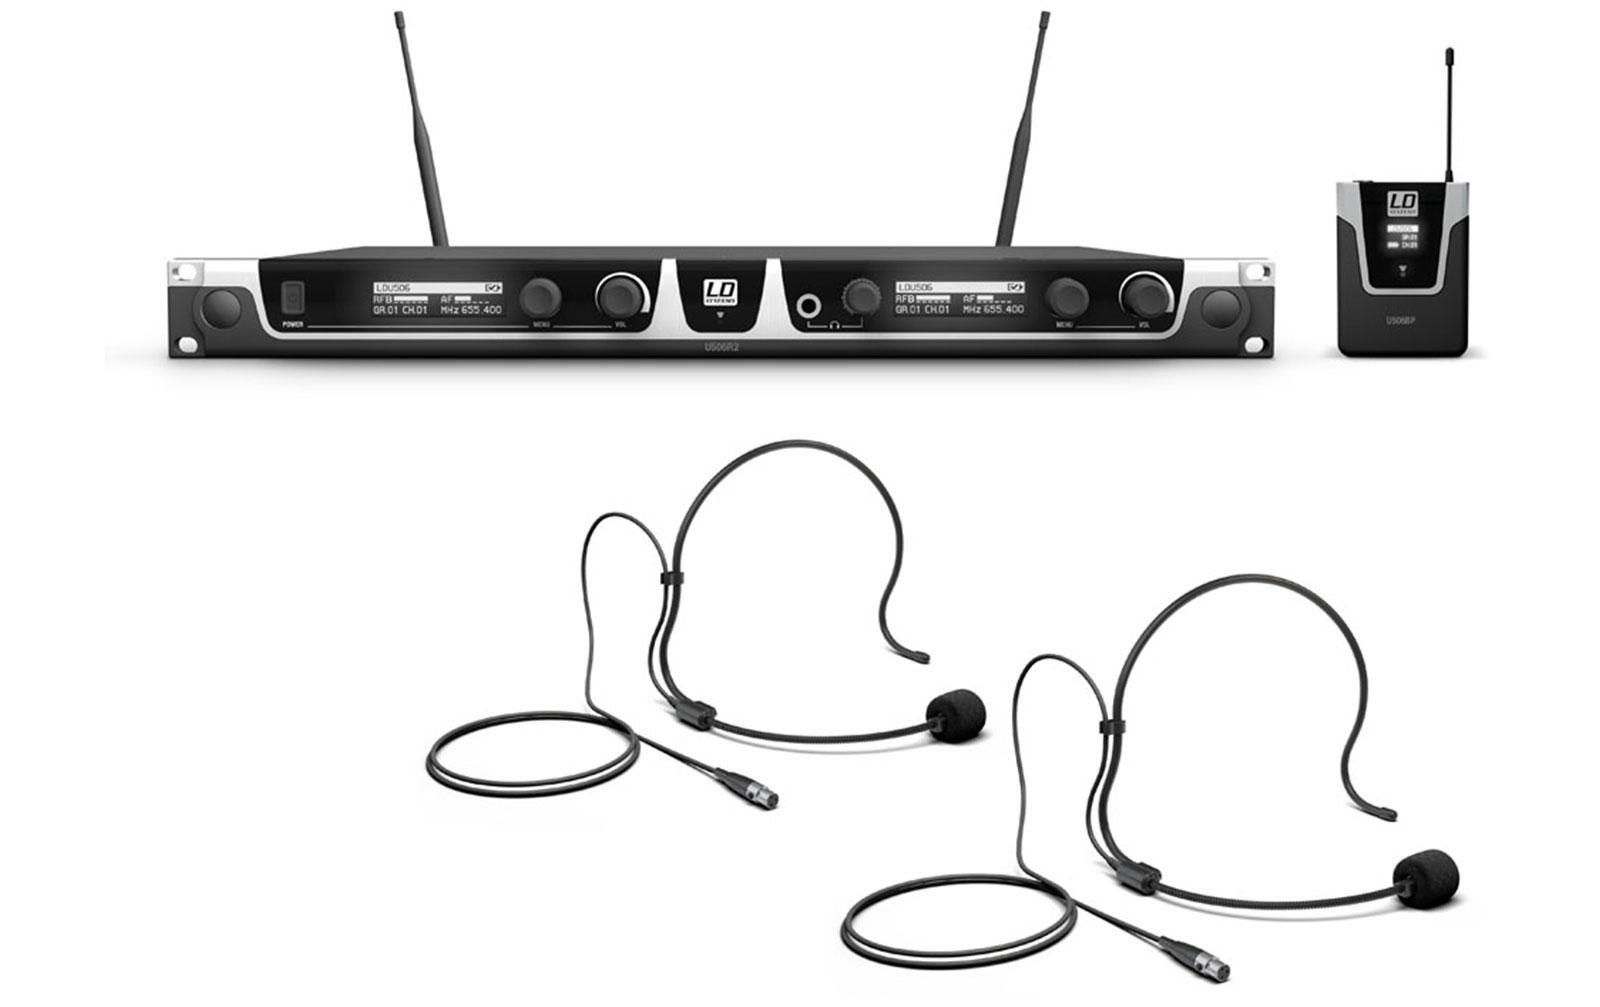 ld-systems-u506-bph-2-funkmikrofon-system-mit-2-x-bodypack-und-2-x-headset